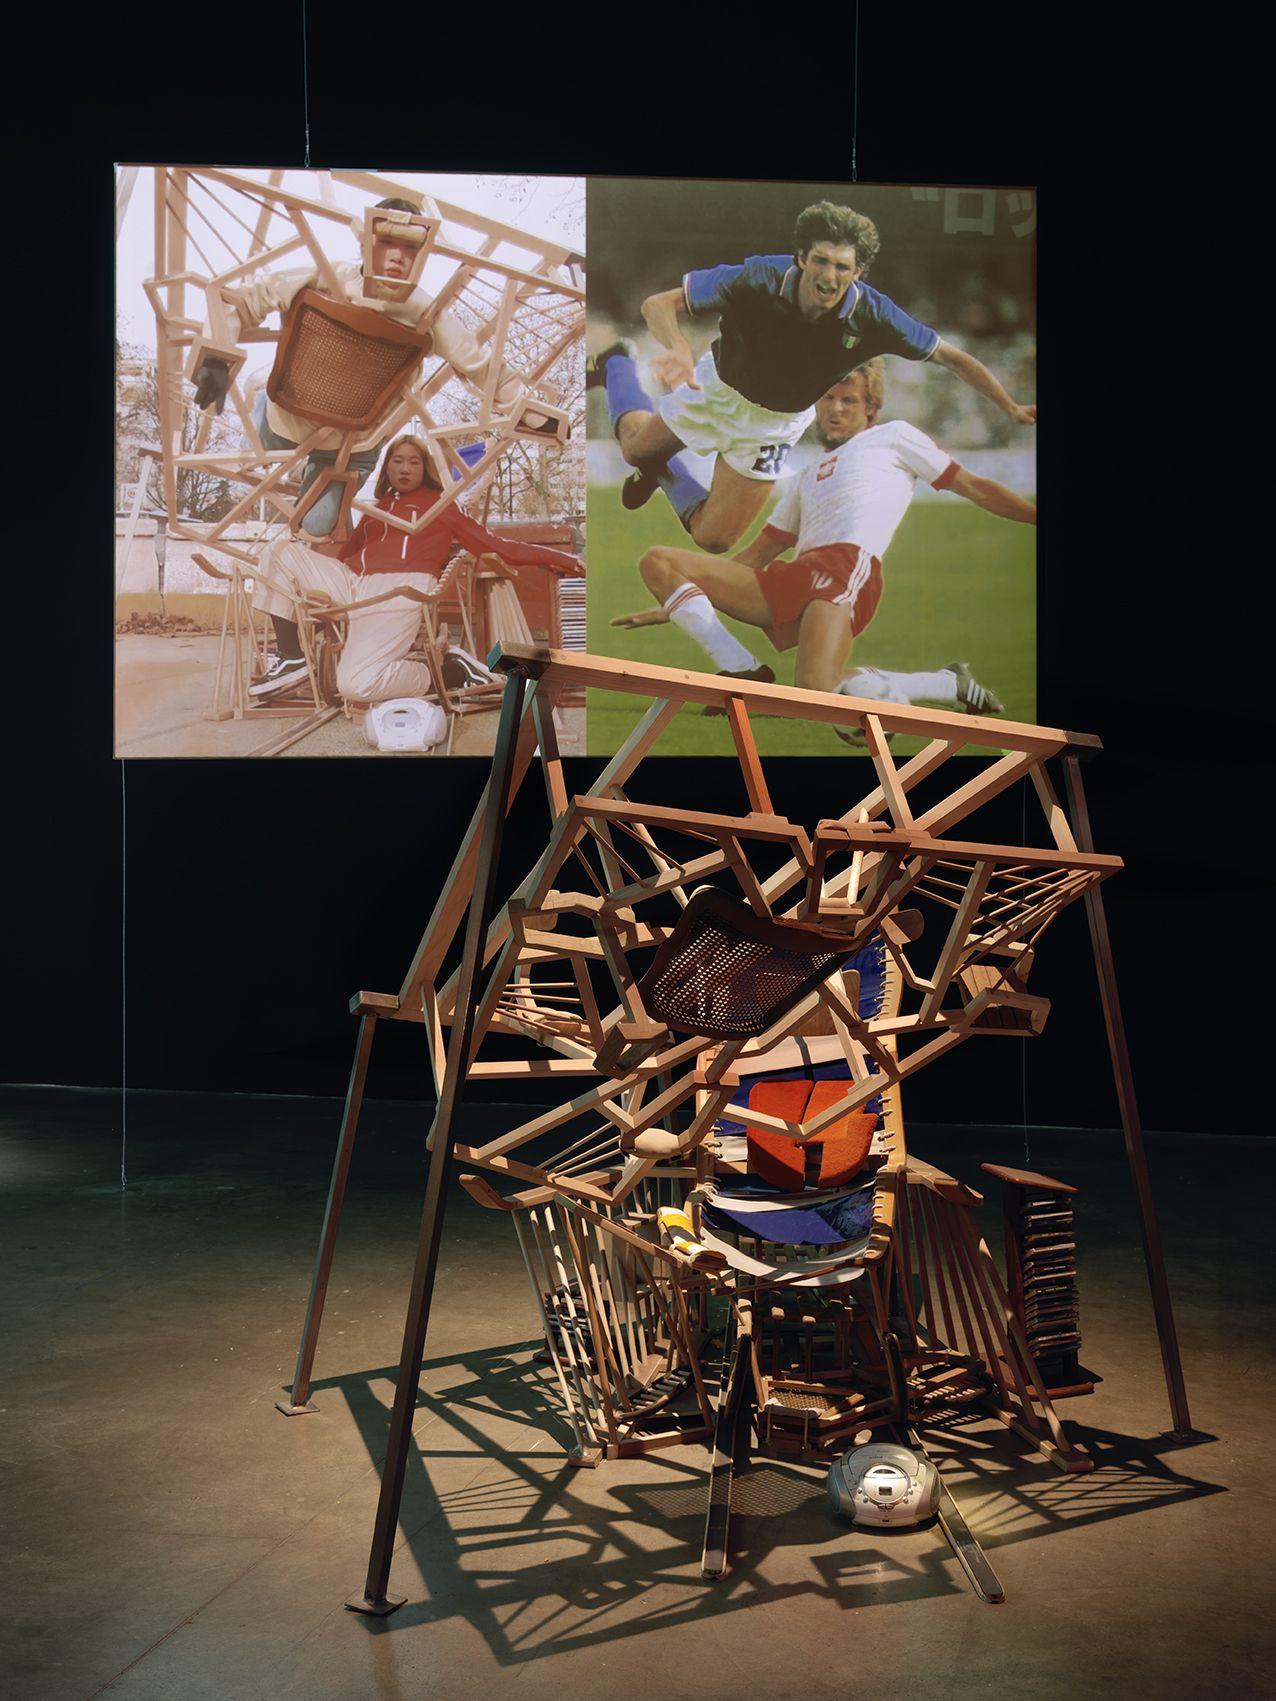 Izumi re-imagines a tackle by Poland's Stefan Majewski on Italian star Paolo Rossi in the 1982 FIFA World Cup semi-final.